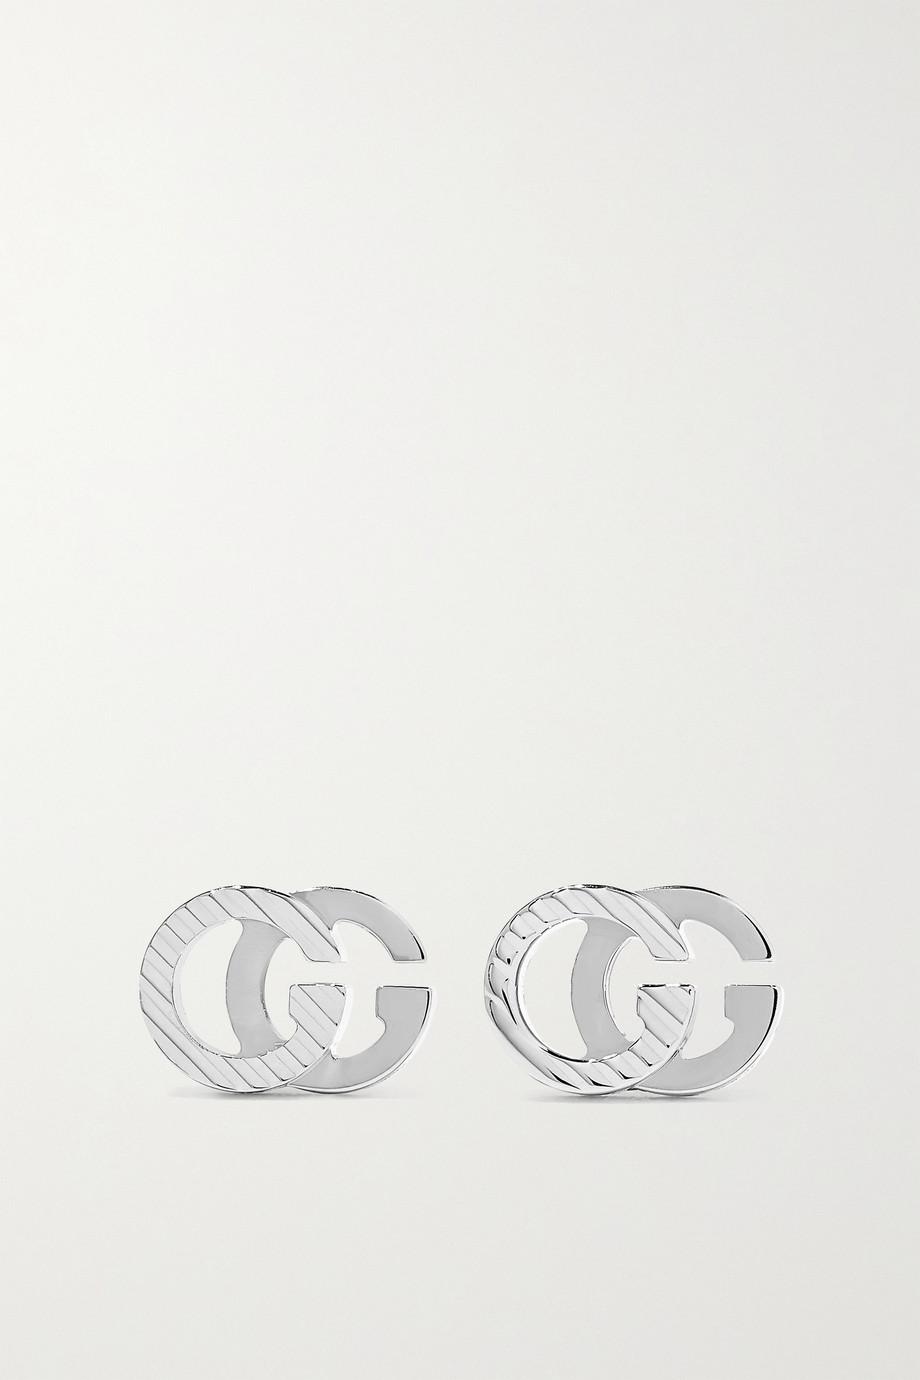 Gucci GG Running 18-karat white gold earrings